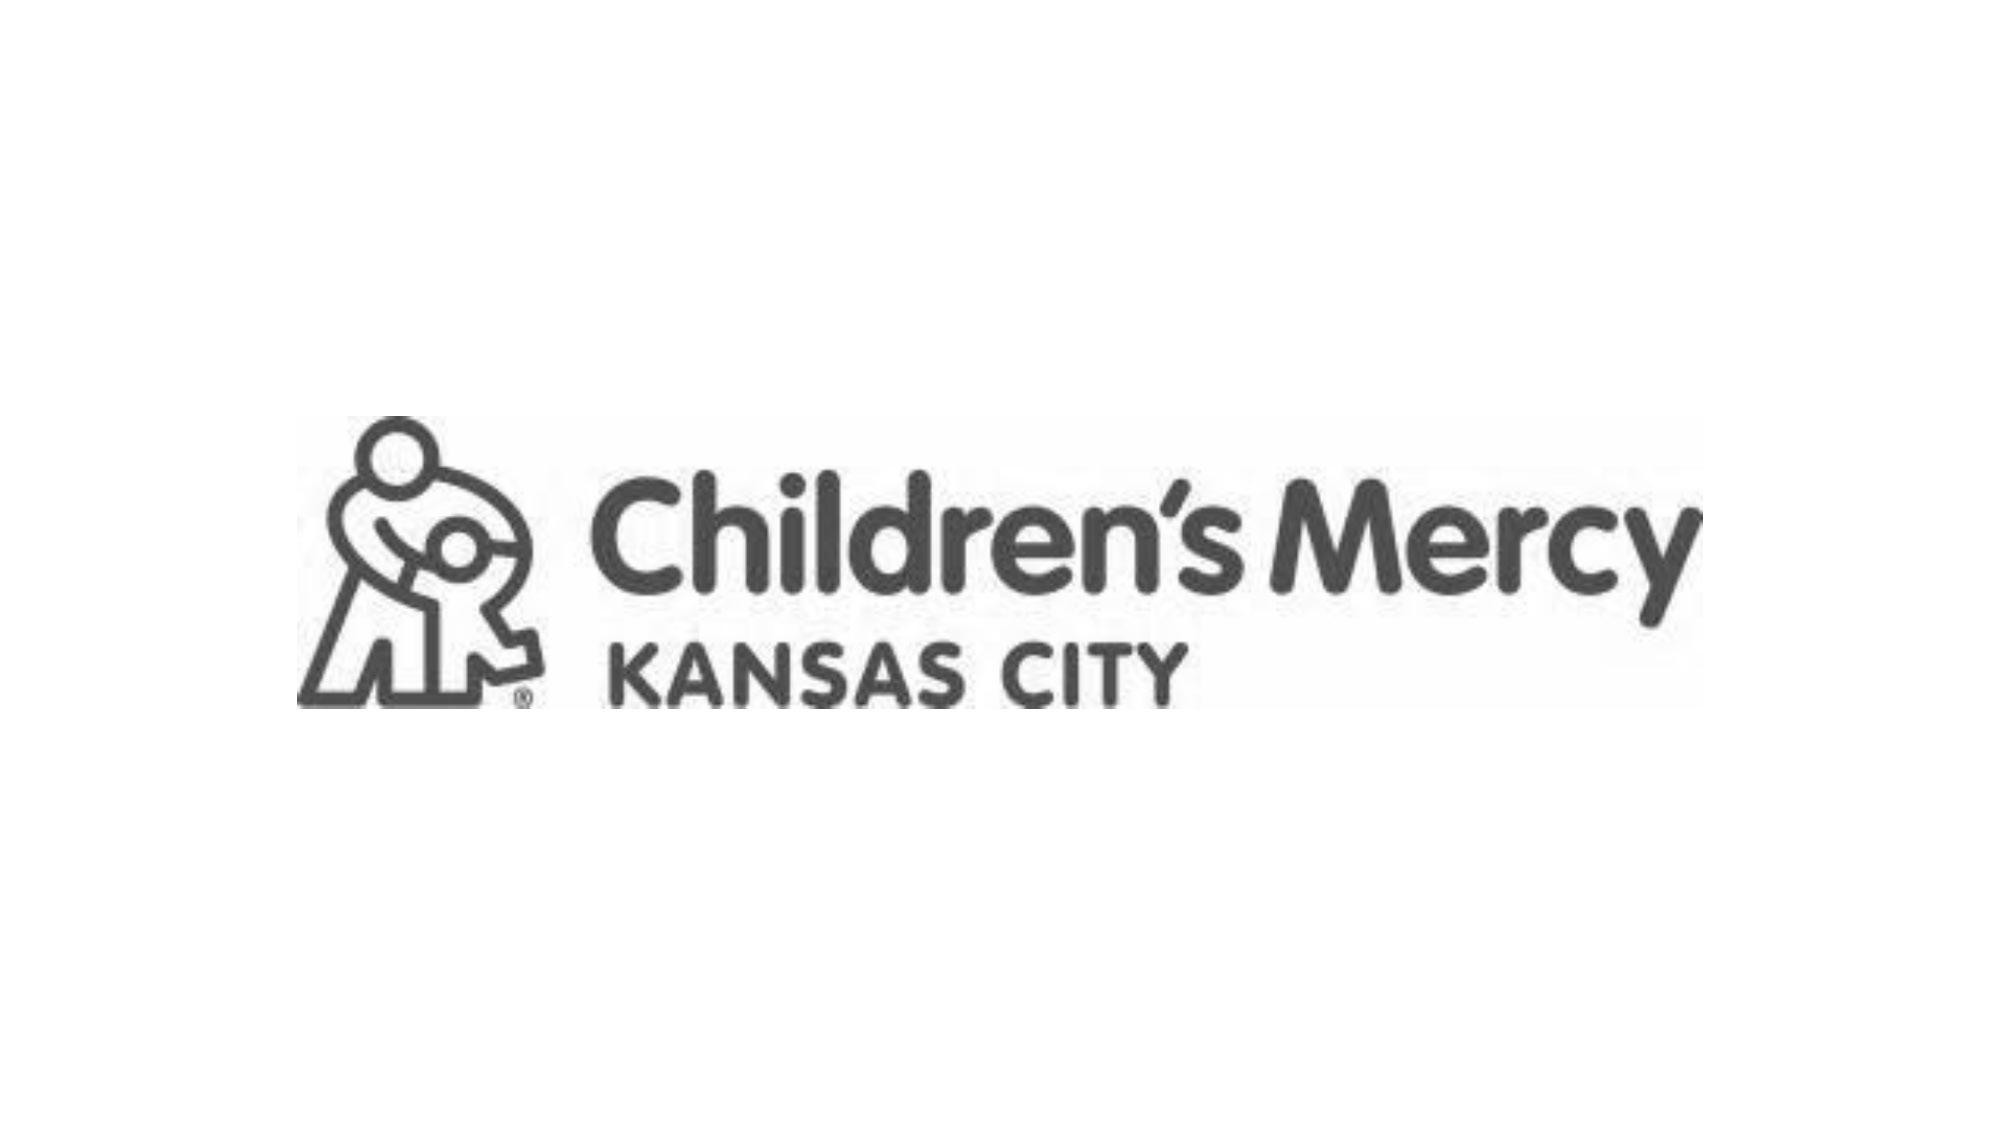 Children's Mercy - Kansas City - logo